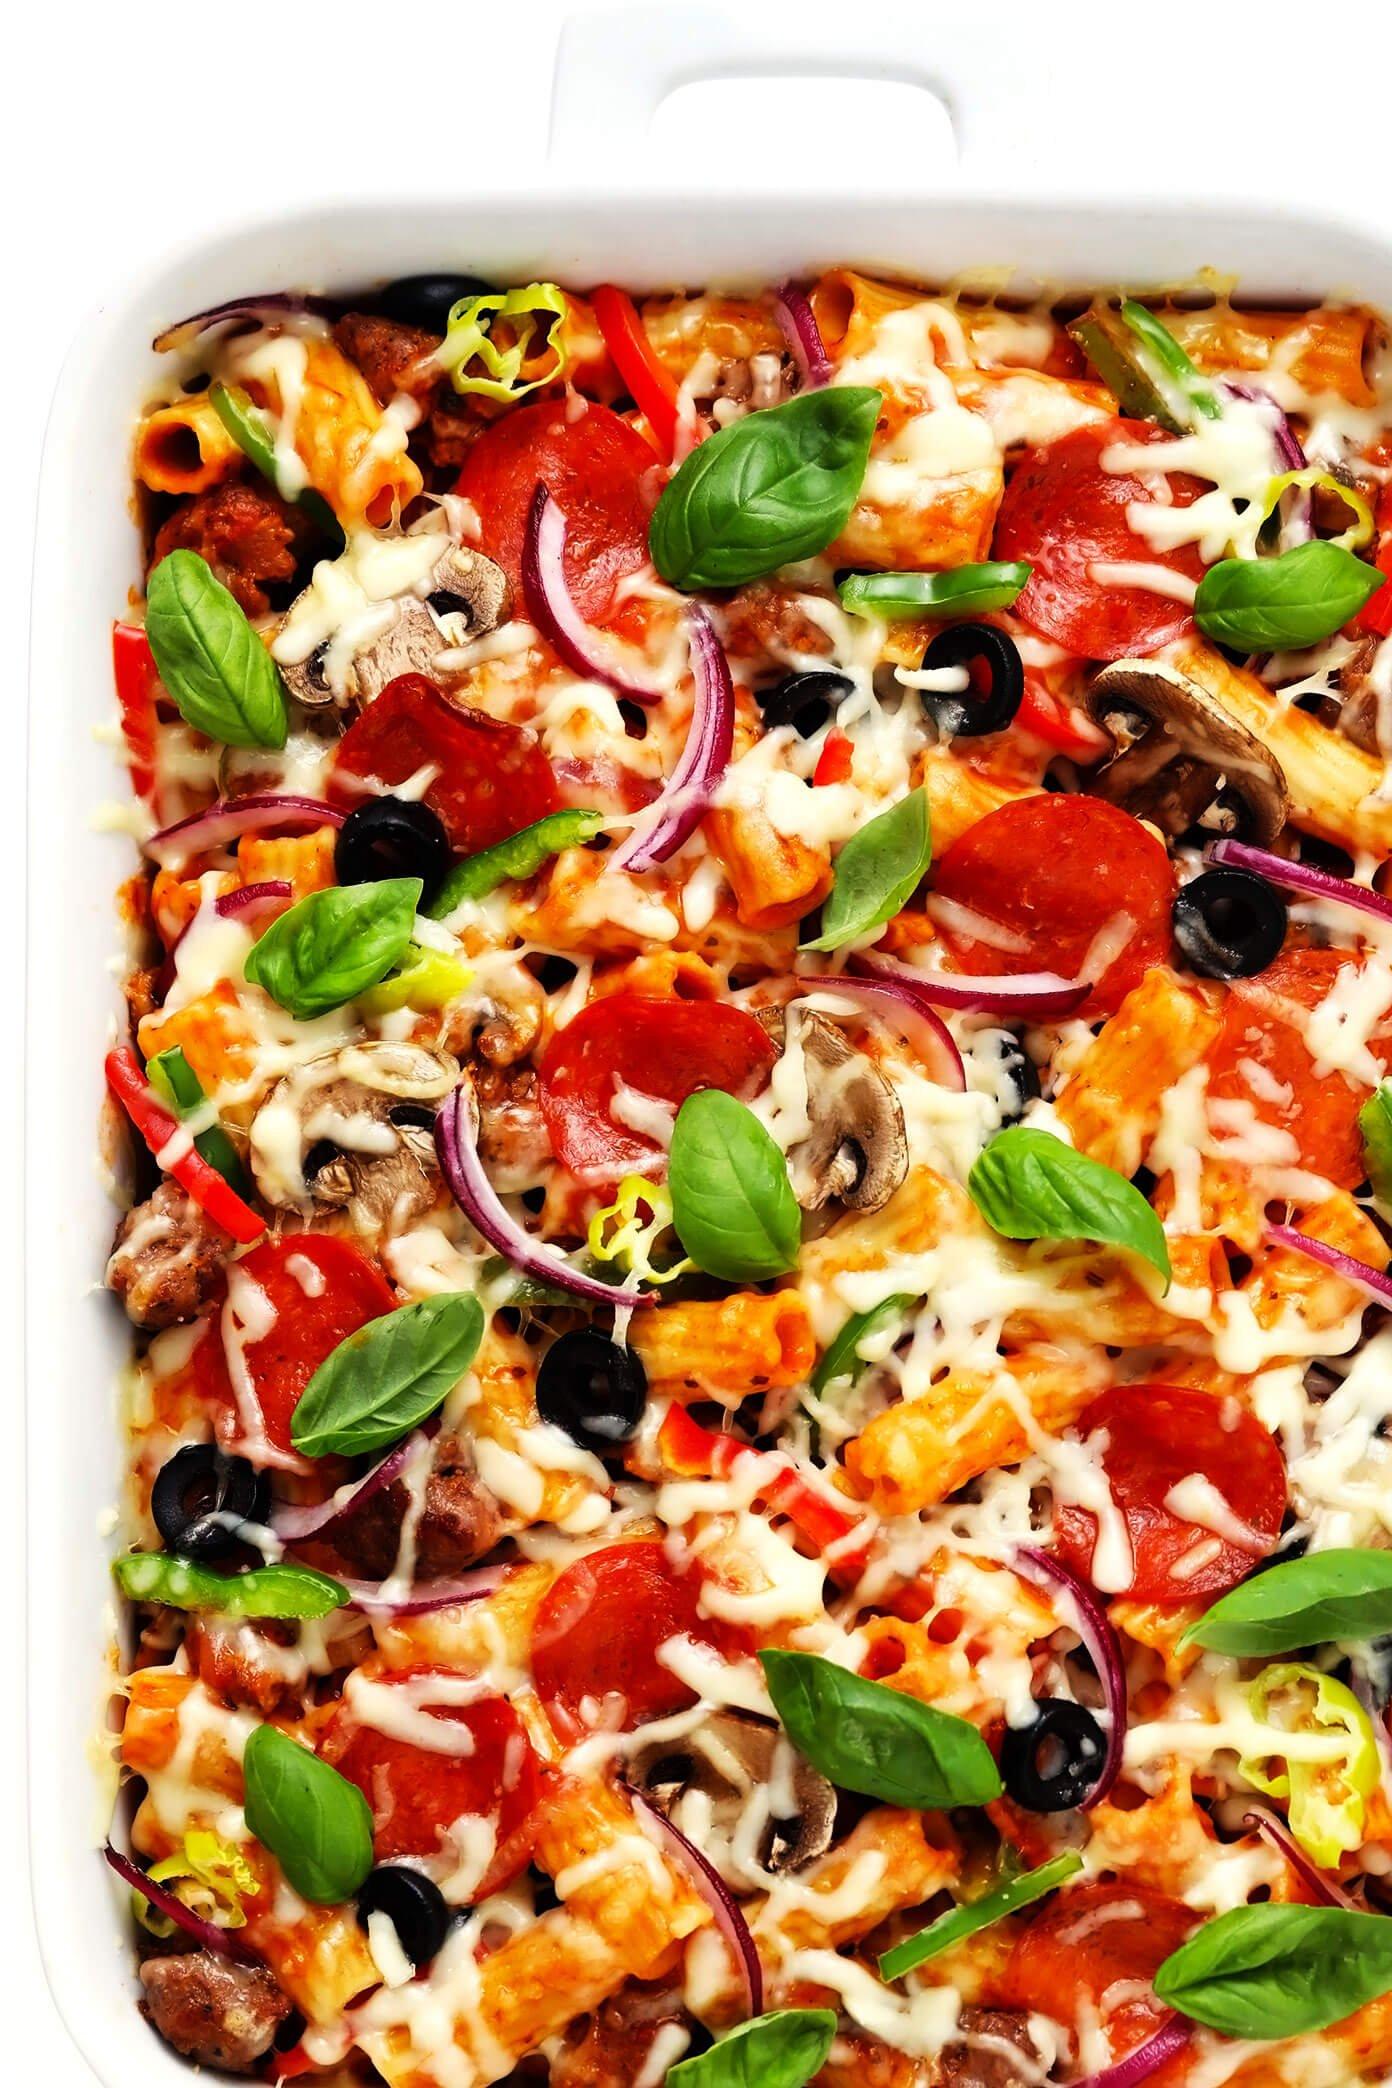 Pizza Baked Ziti Recipe in Casserole Pan